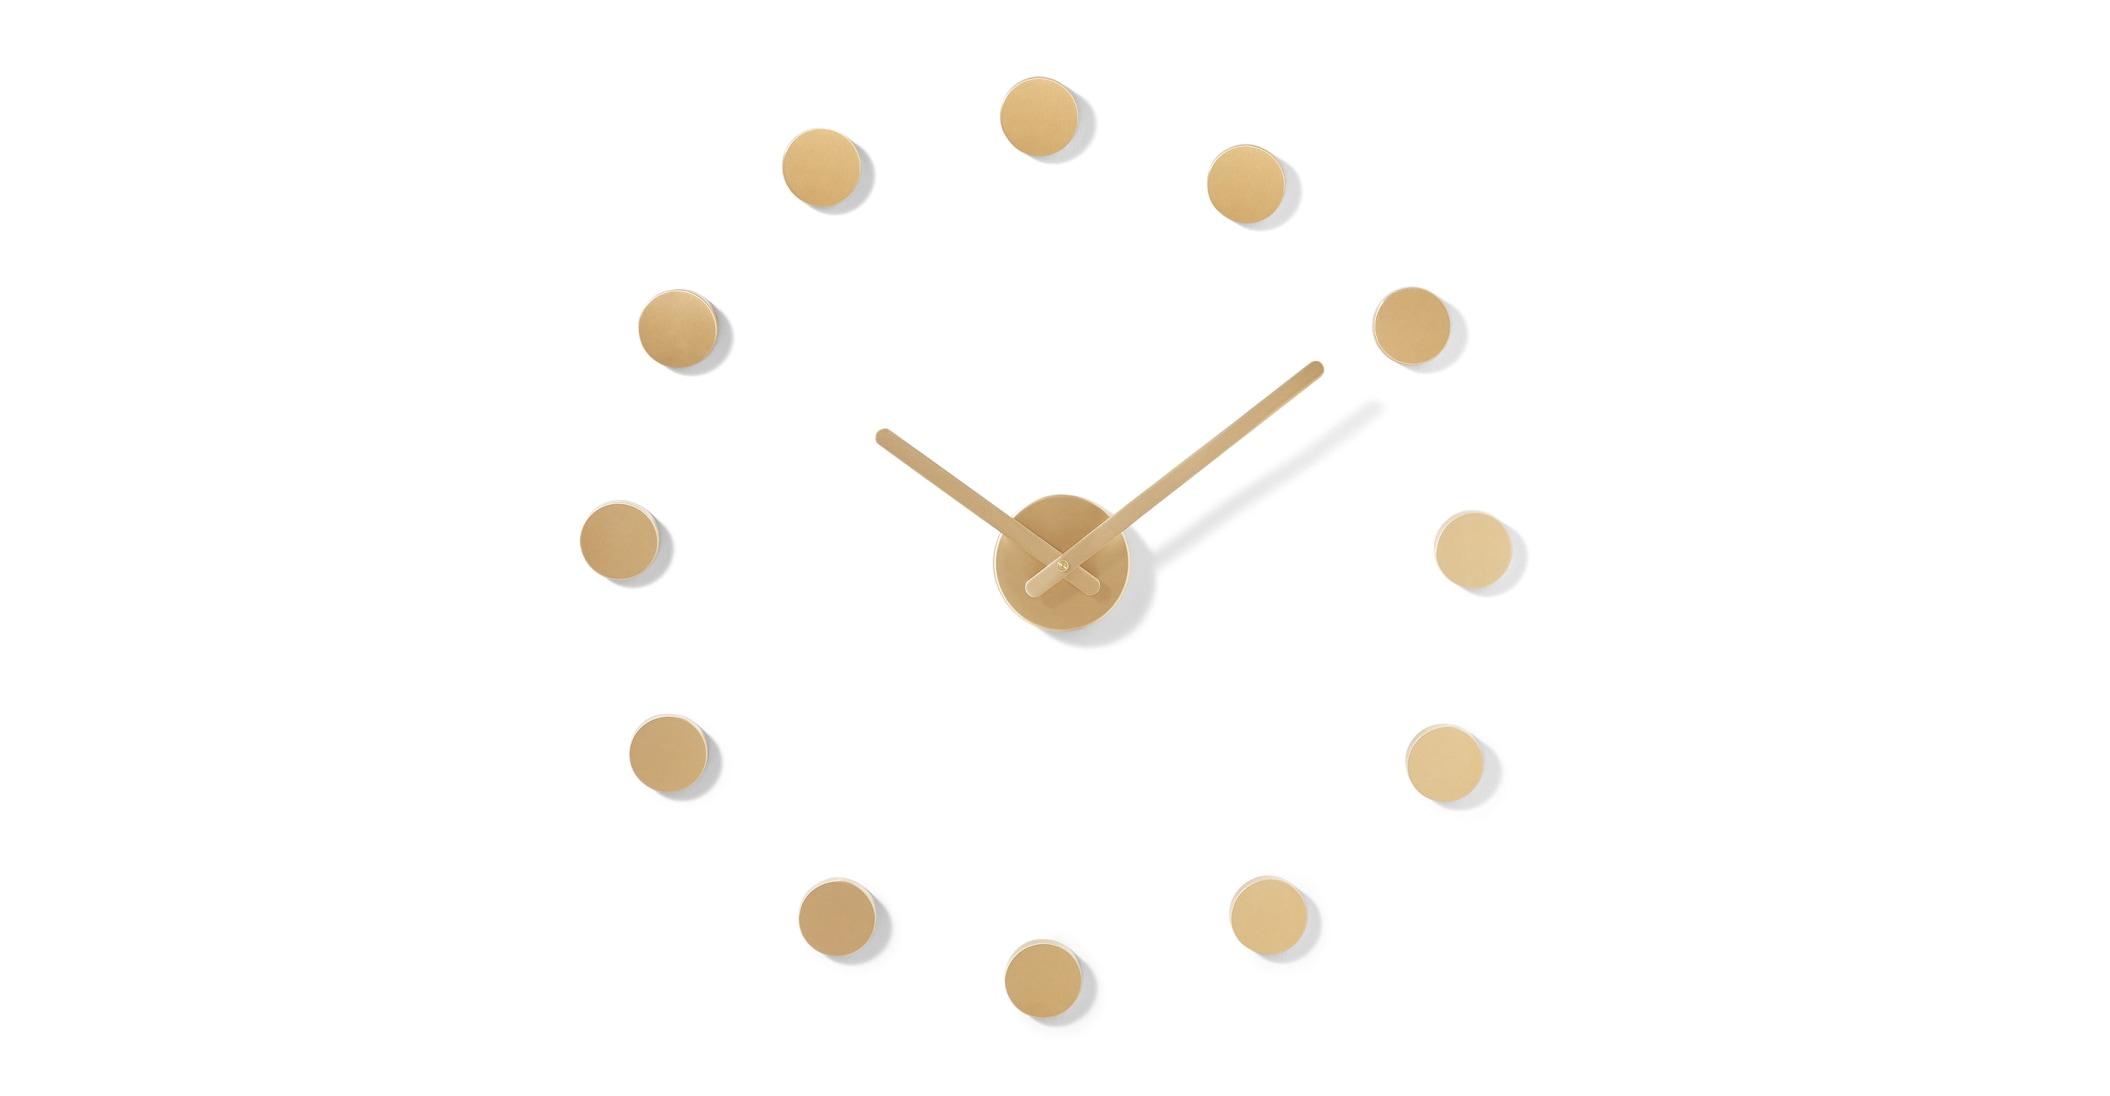 Reloj de pared DIY con marcadores circulares Rani, latón cepillado